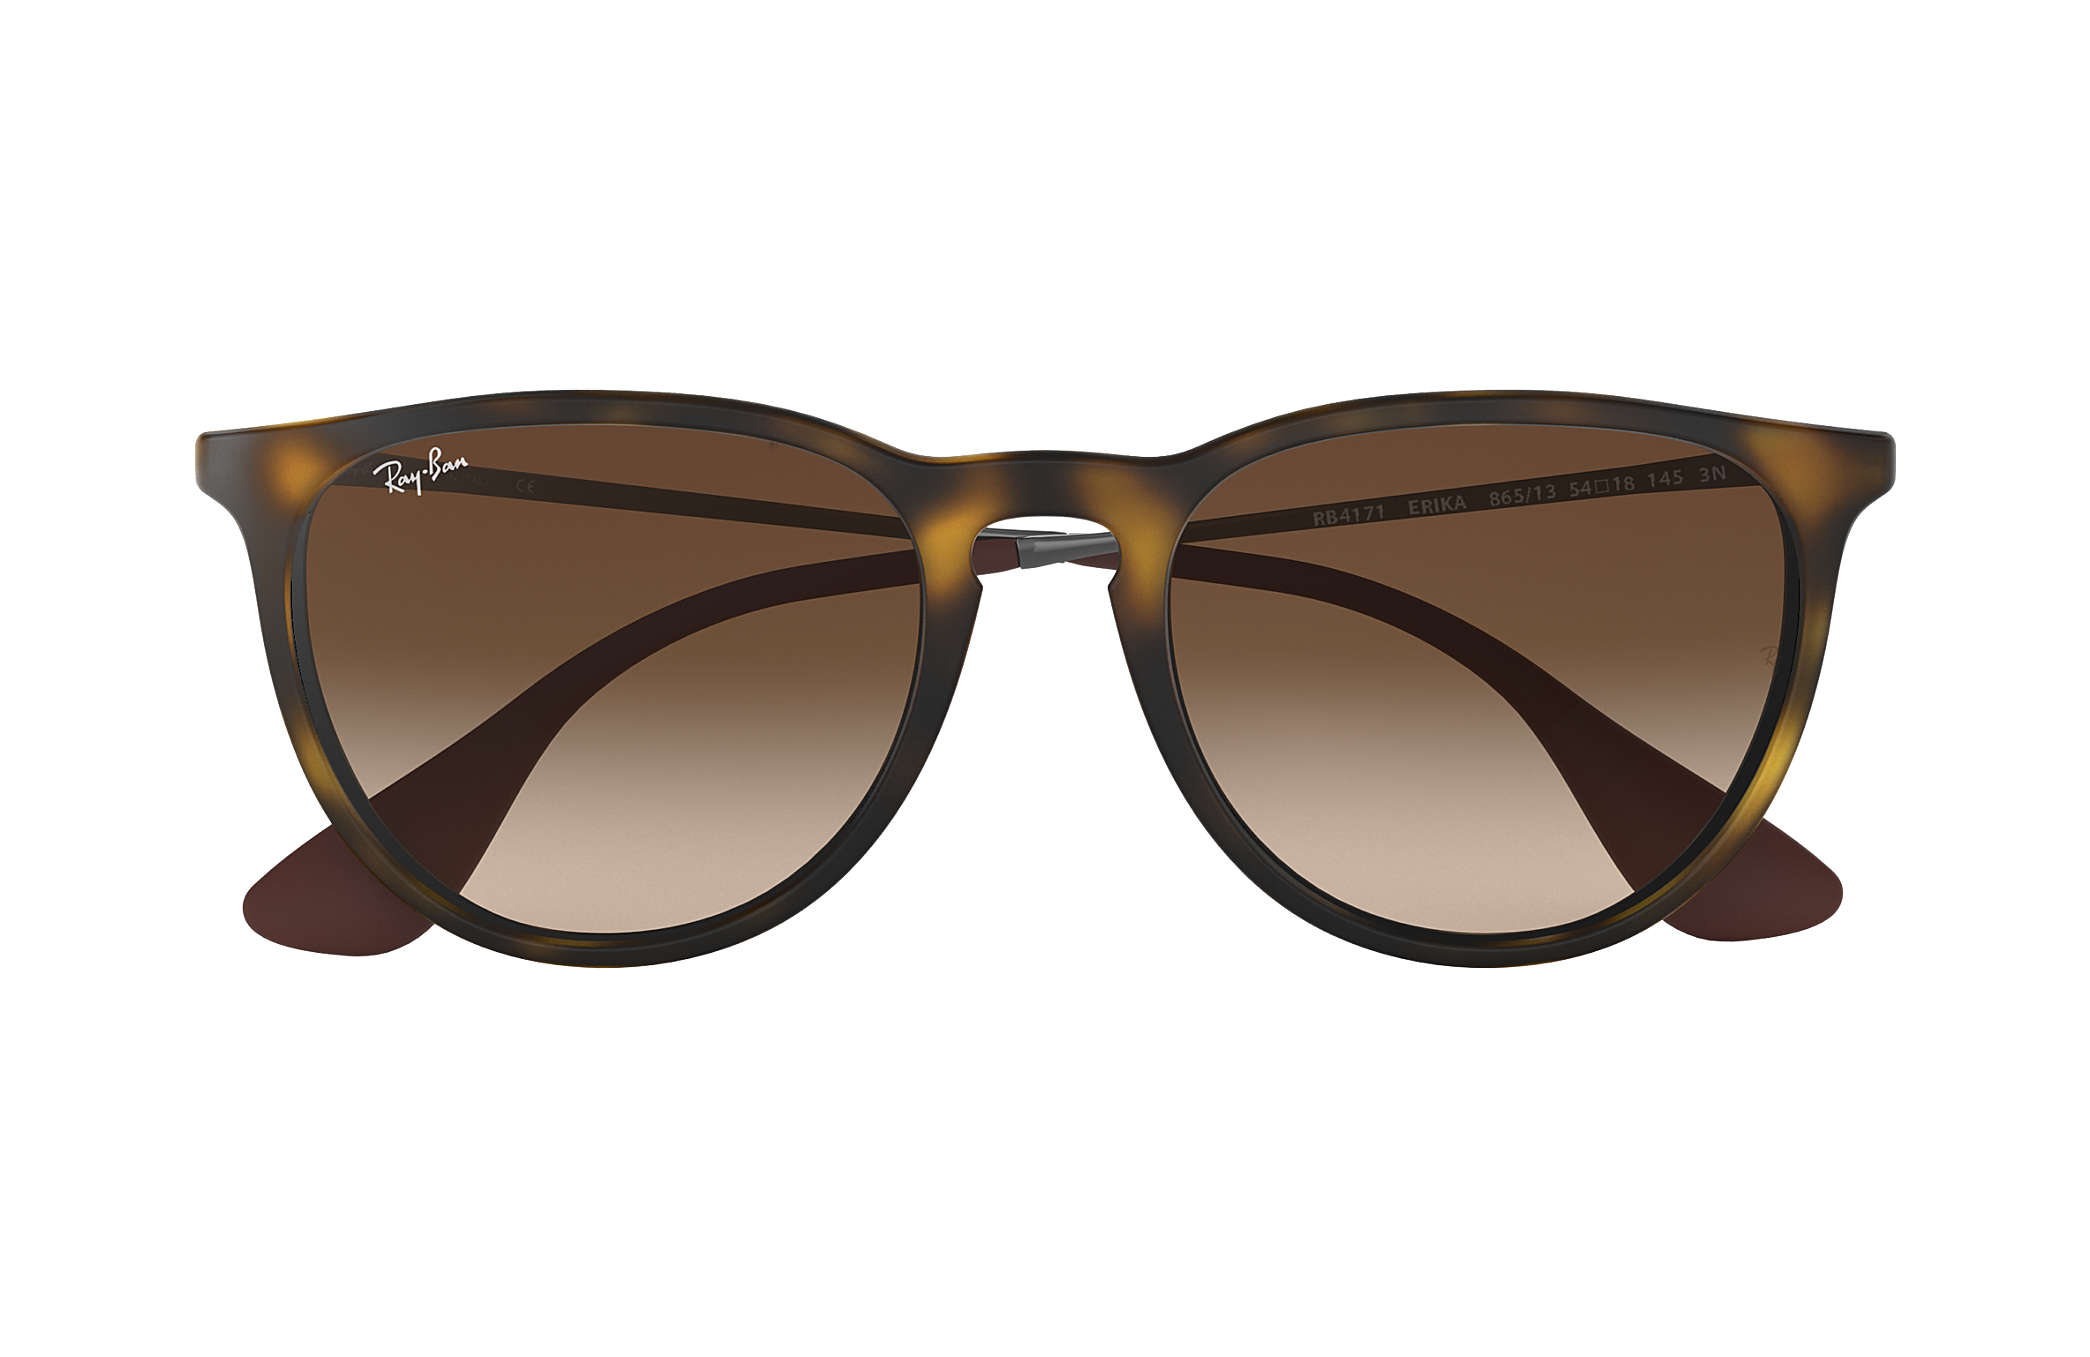 9a777754eaeec8 Ray-Ban Erika Classic RB4171 Tortoise - Nylon - Brown Lenses ...